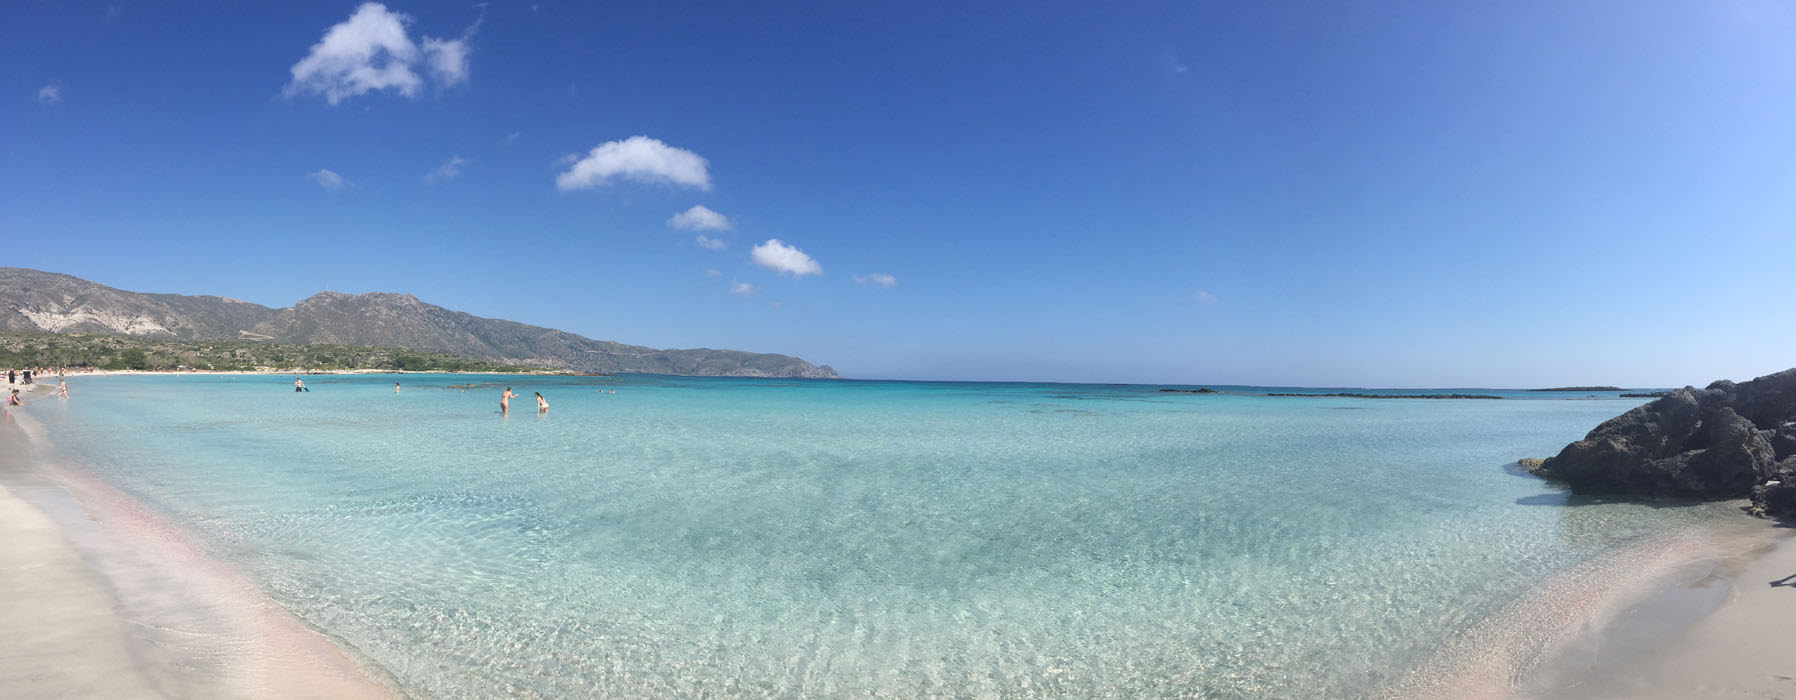 Spiaggia Elafonisi, Creta